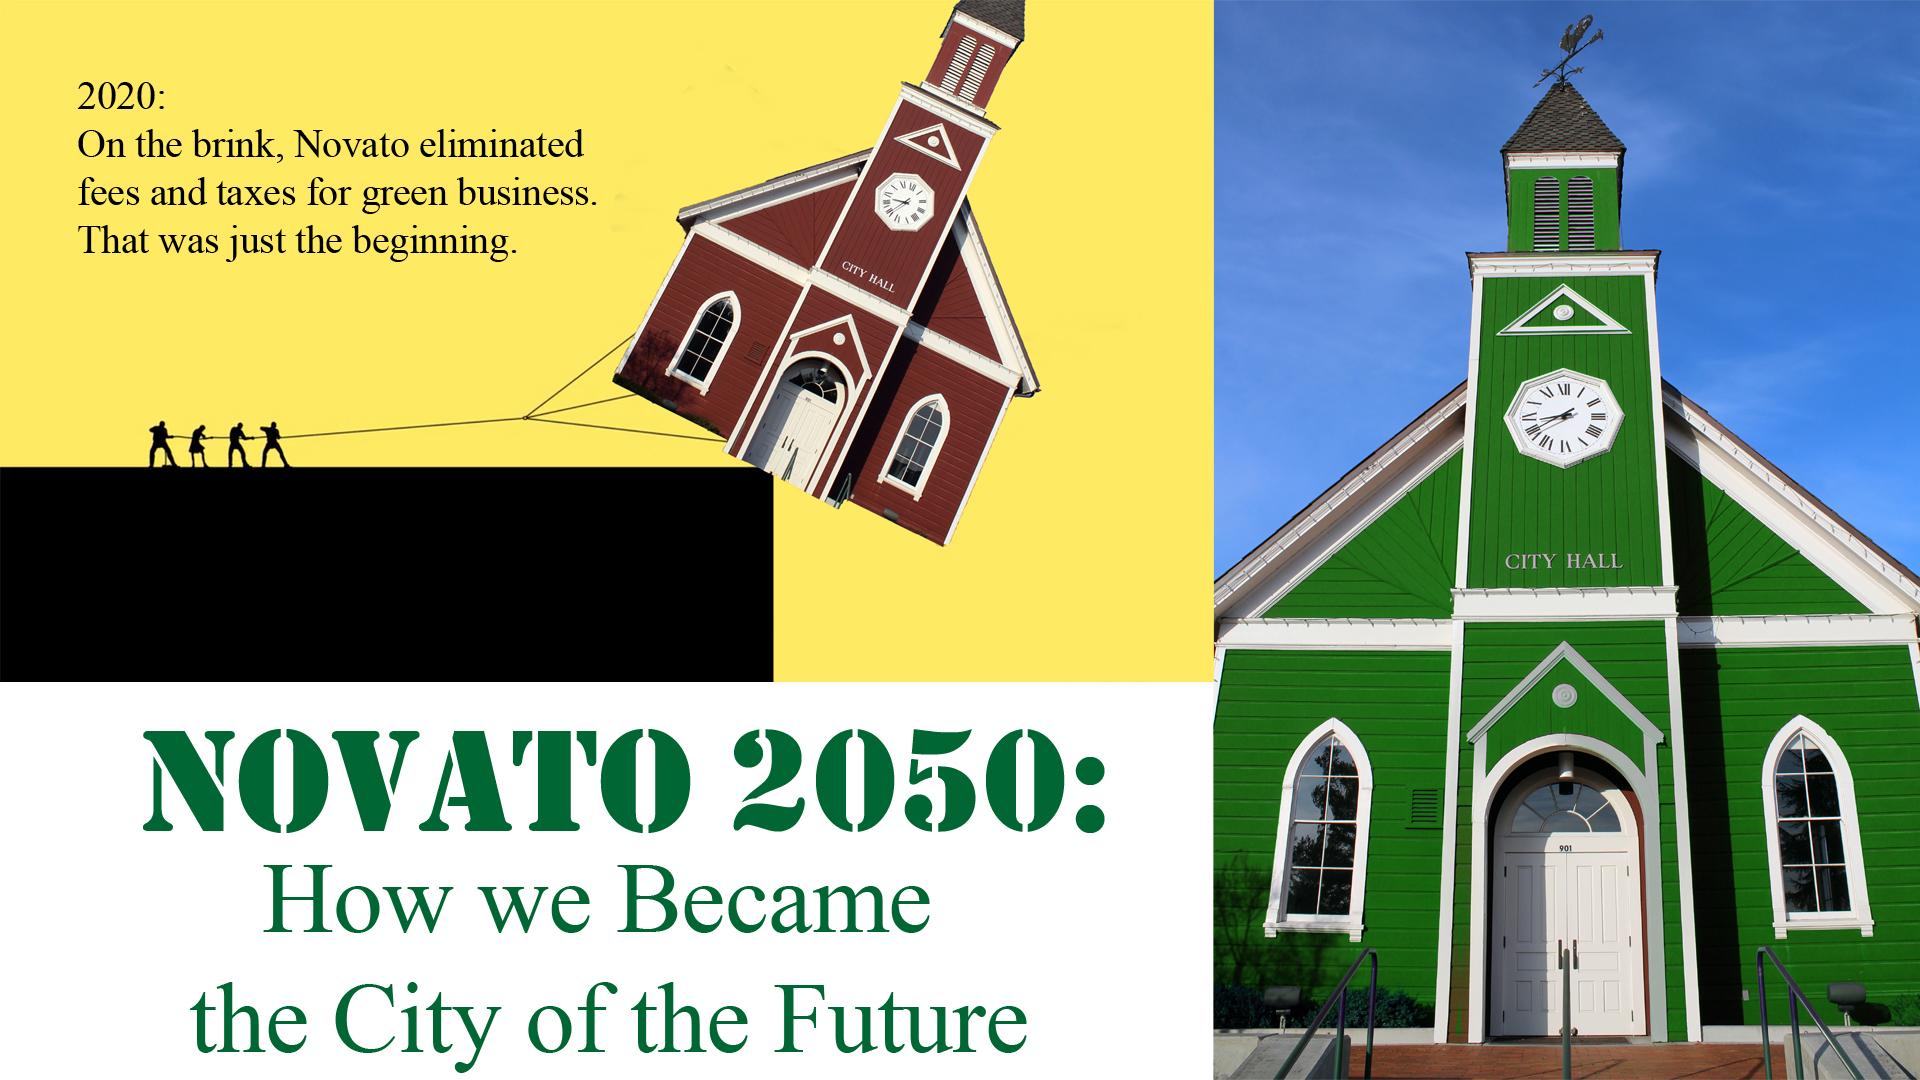 Novato 2050 how we became v2.jpg